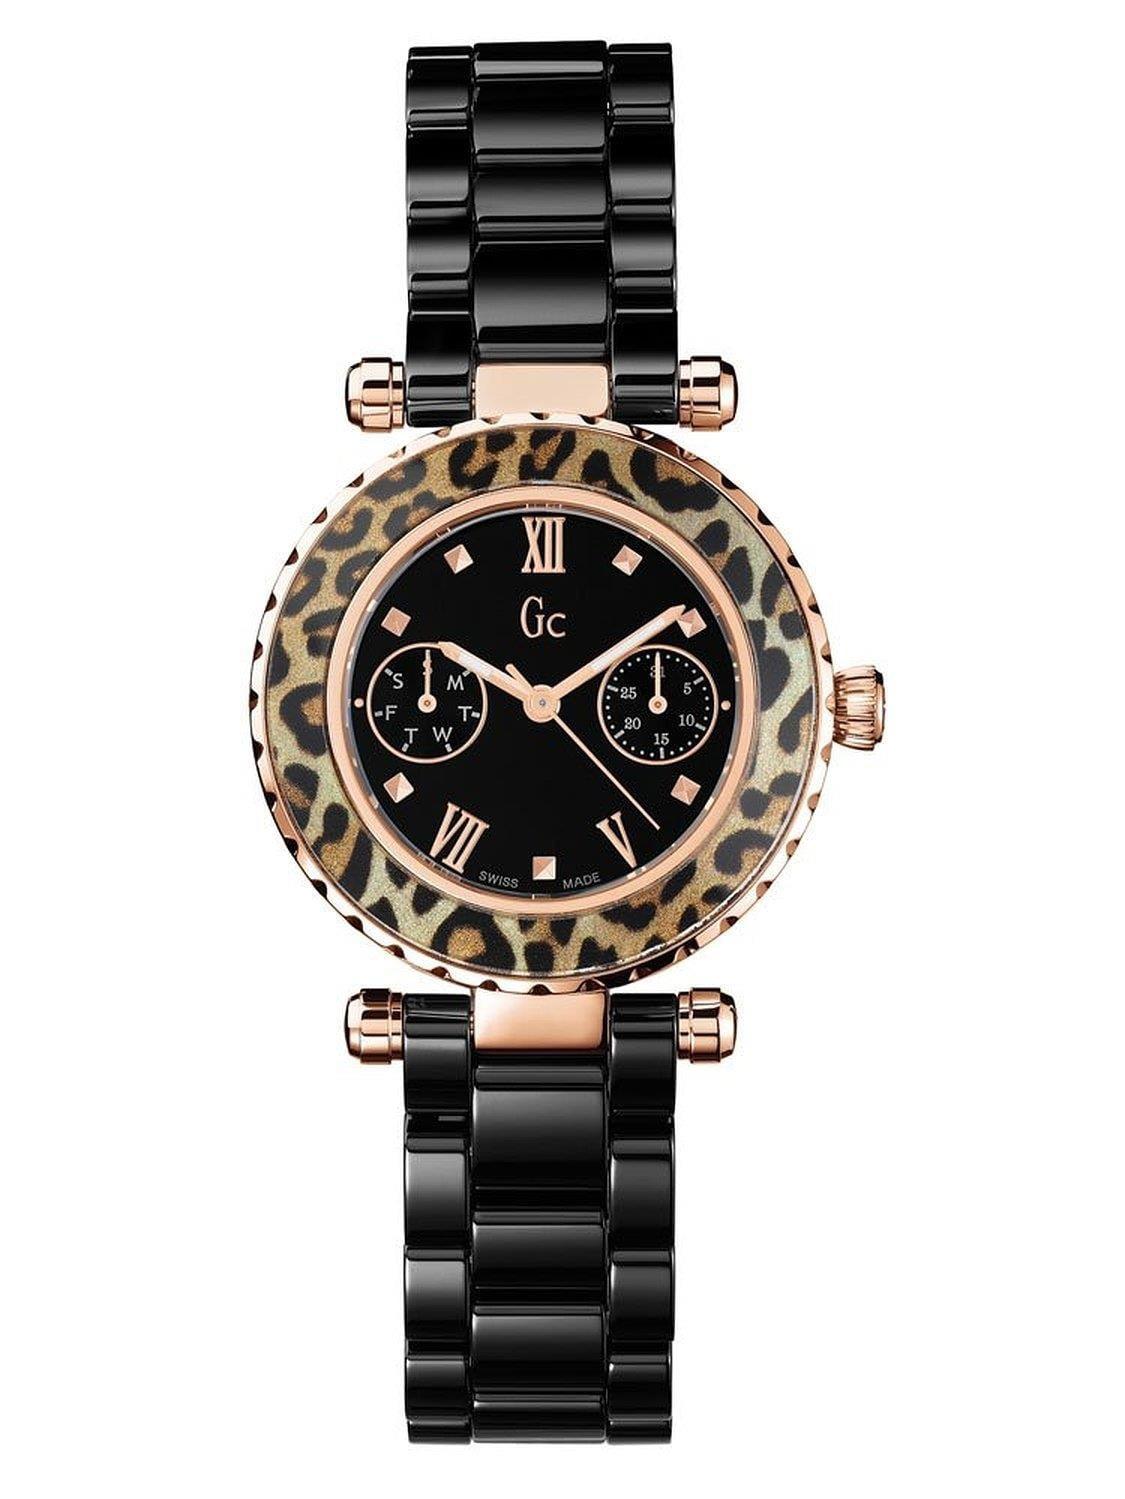 Collection Women's 34mm Black Ceramic Band Steel Case Sapphire Crystal Quartz Analog Watch X35016L2S